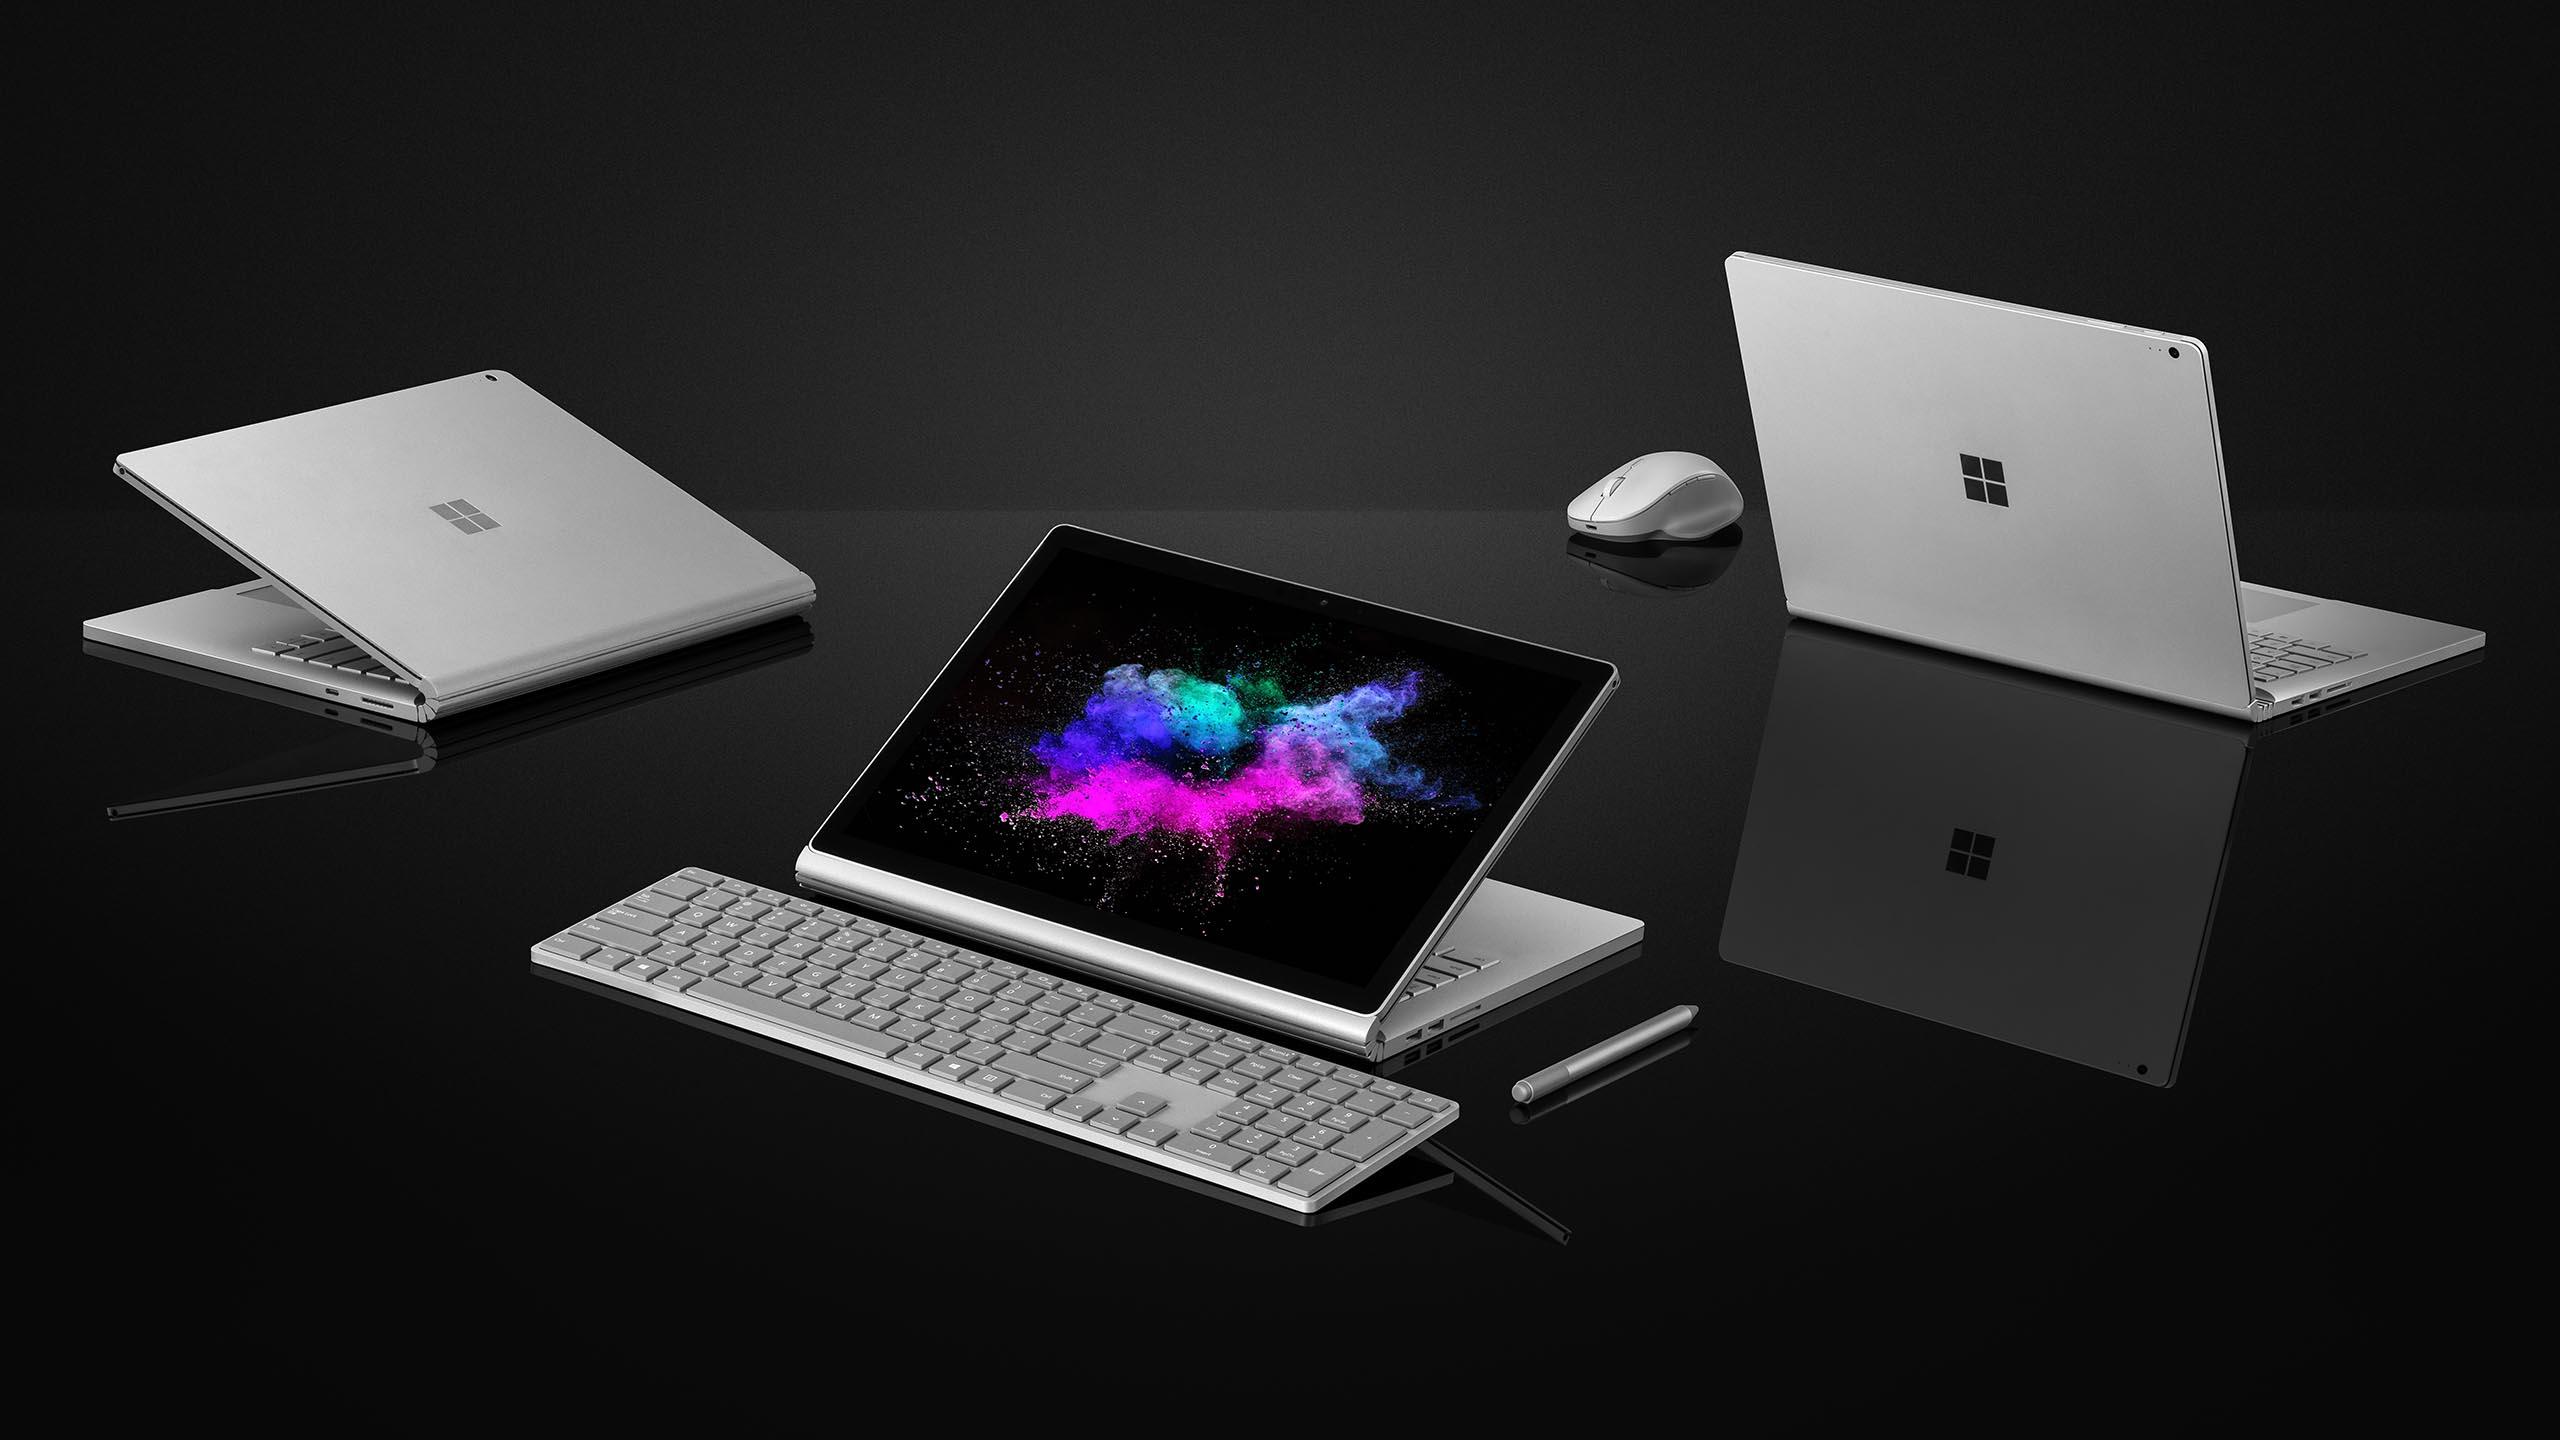 laptop-notebook-microsoft-surface-produktova-fotografie-16-9